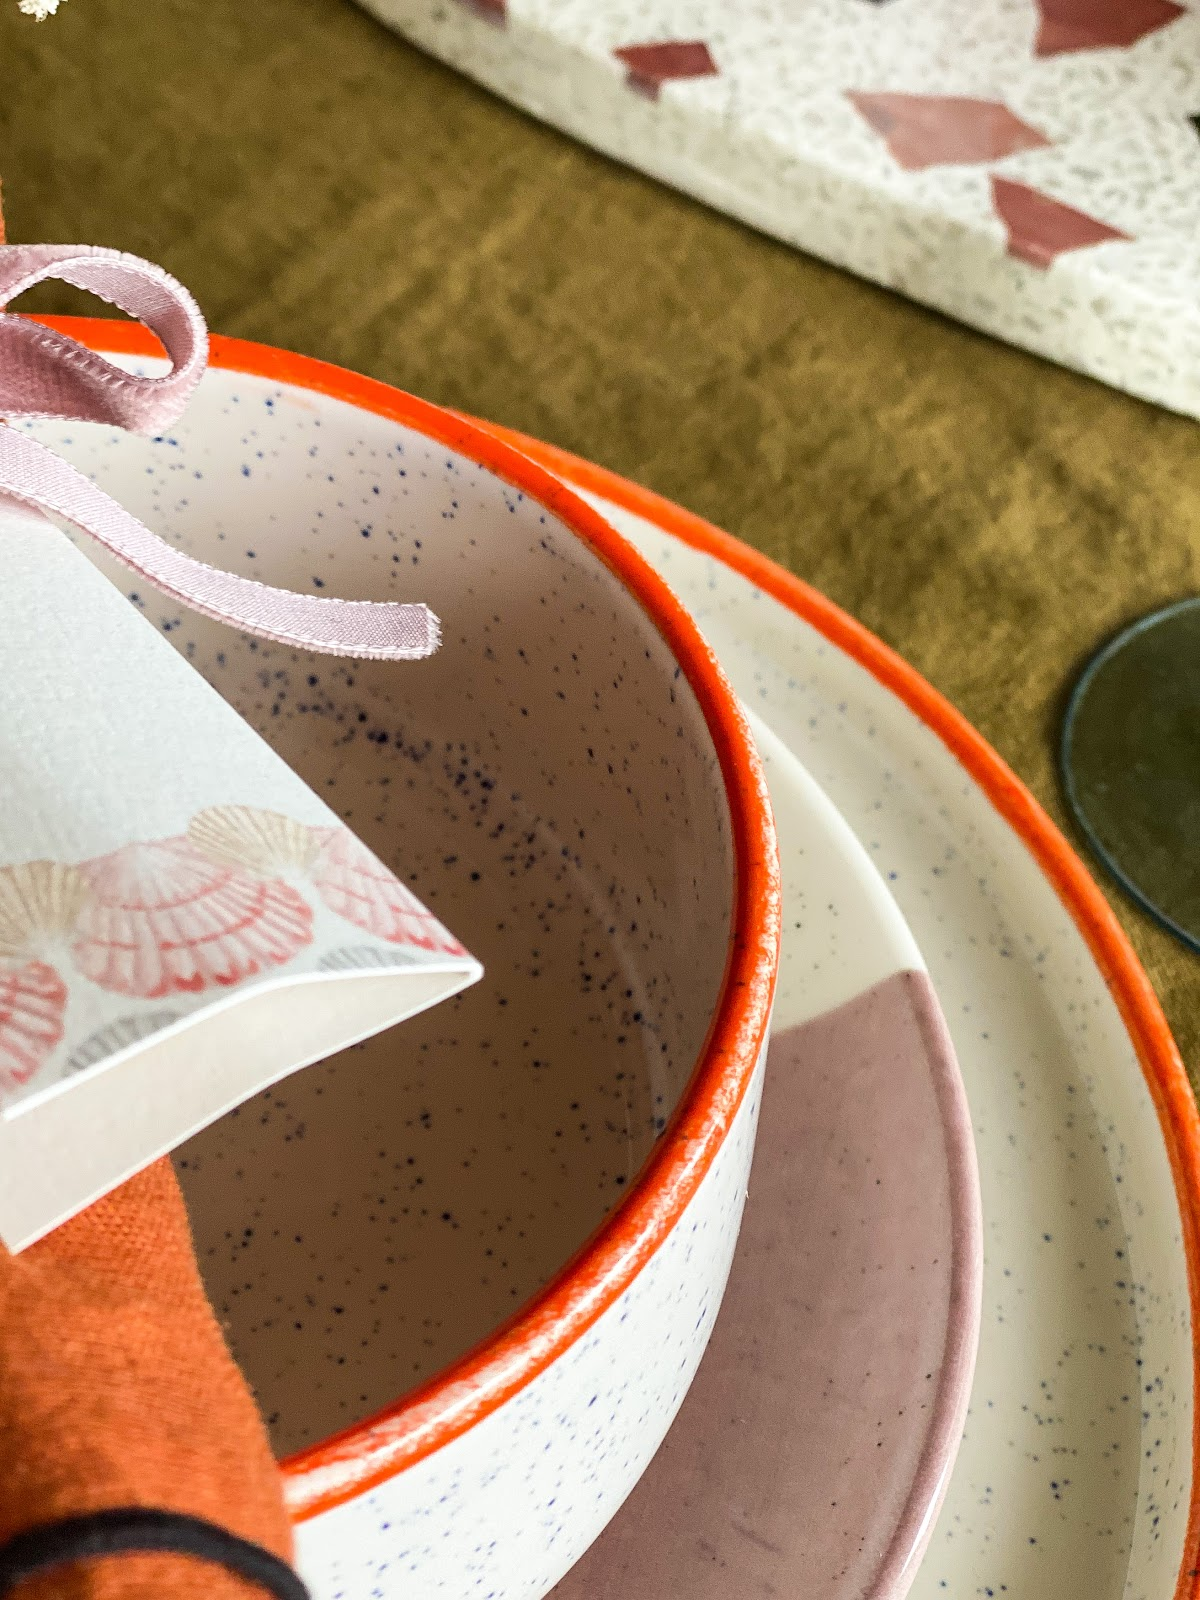 orange and speckled blue dinnerware details